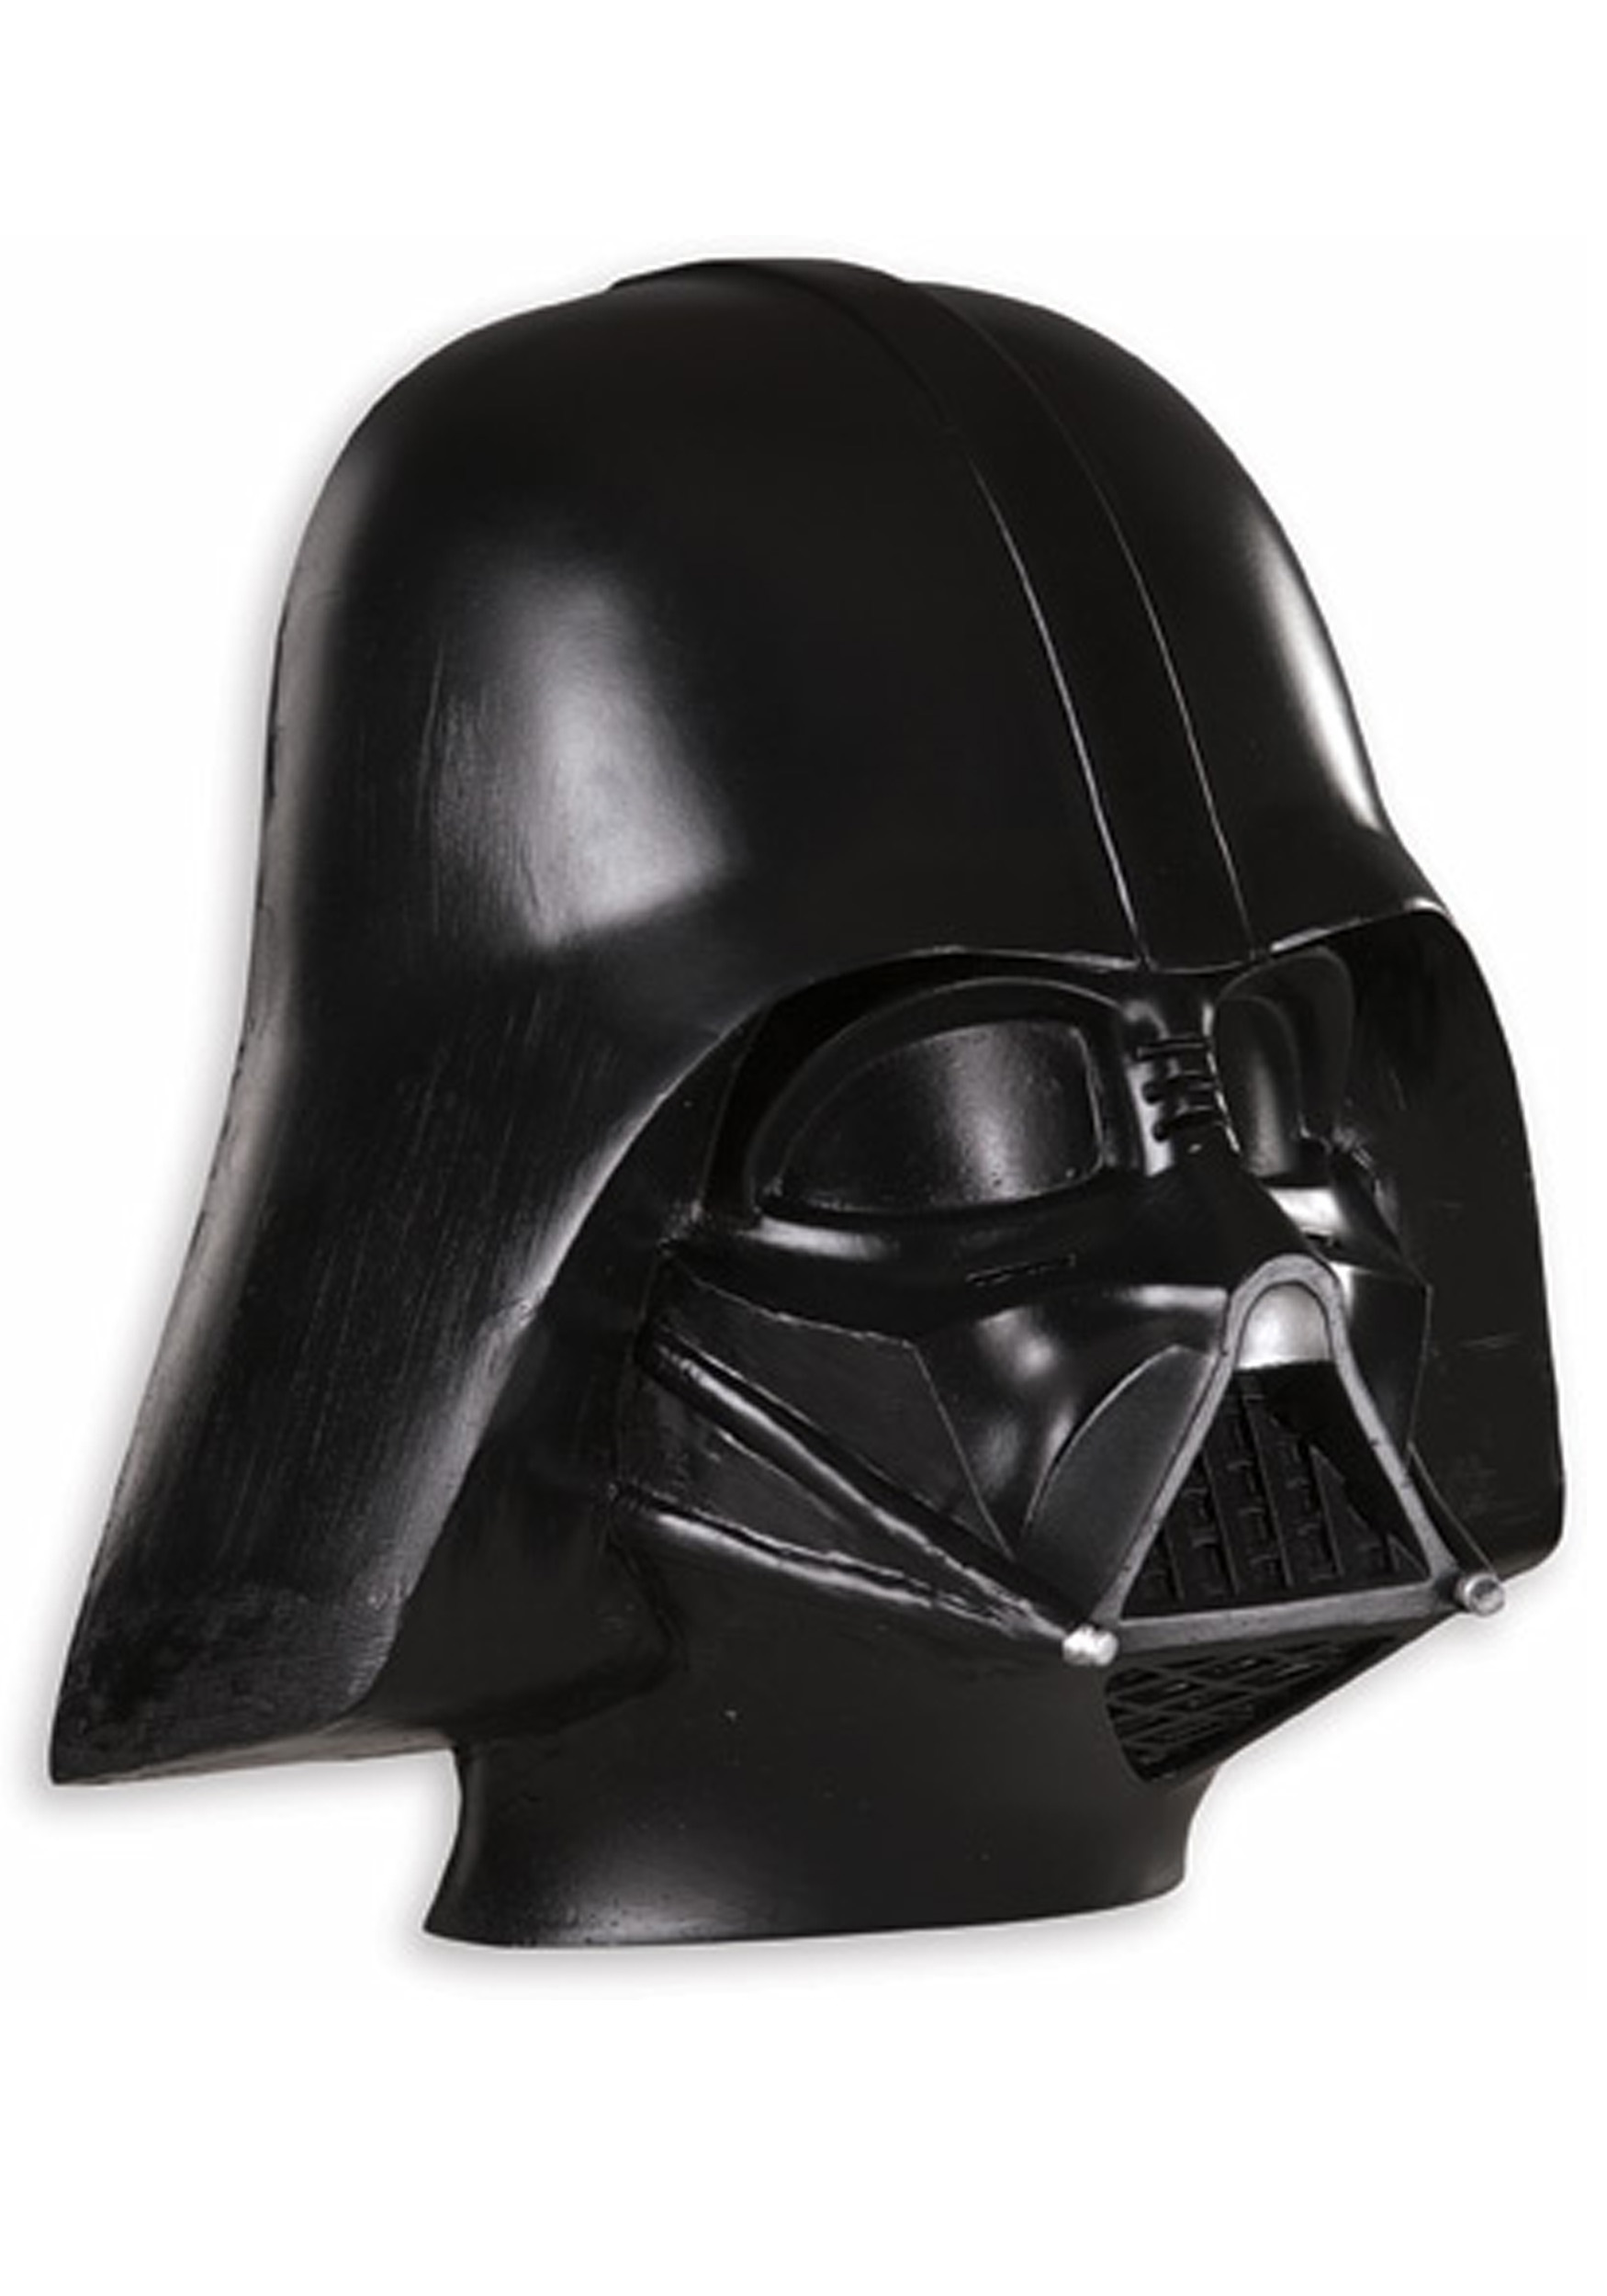 Darth Vader Mask RU3446